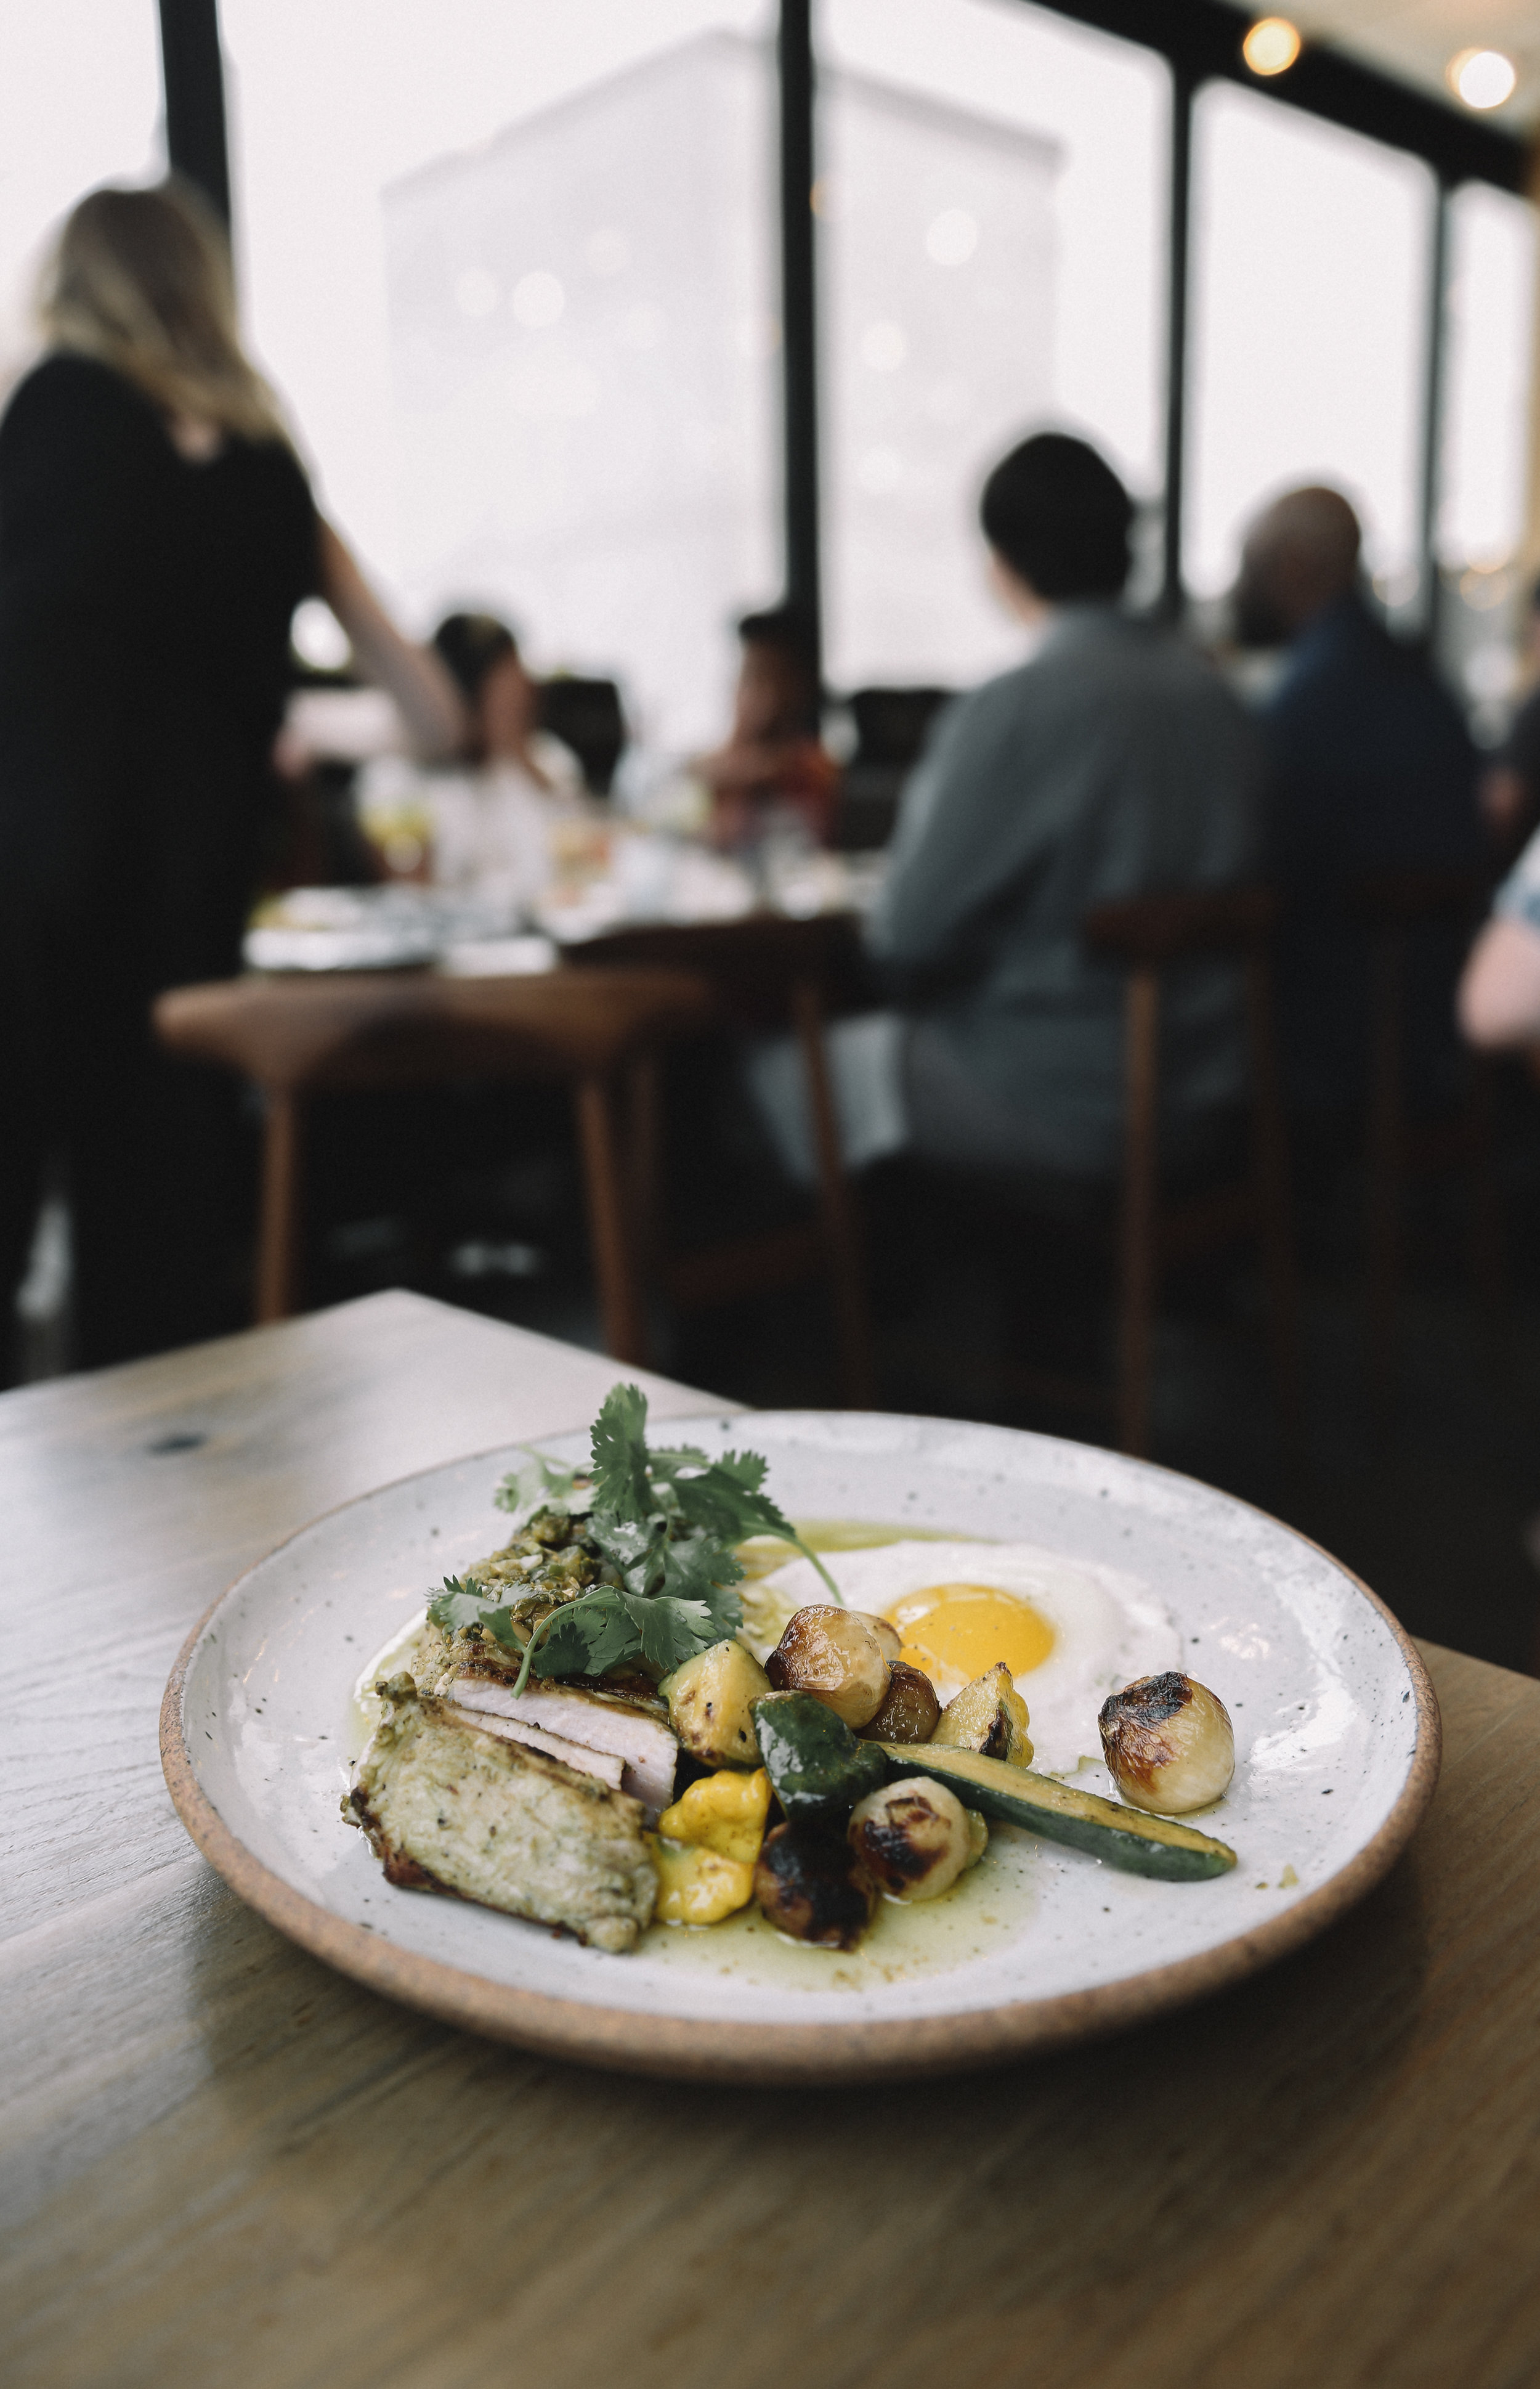 Pork Loin • Poblano • Summer Squash • Pipian • Fried Egg